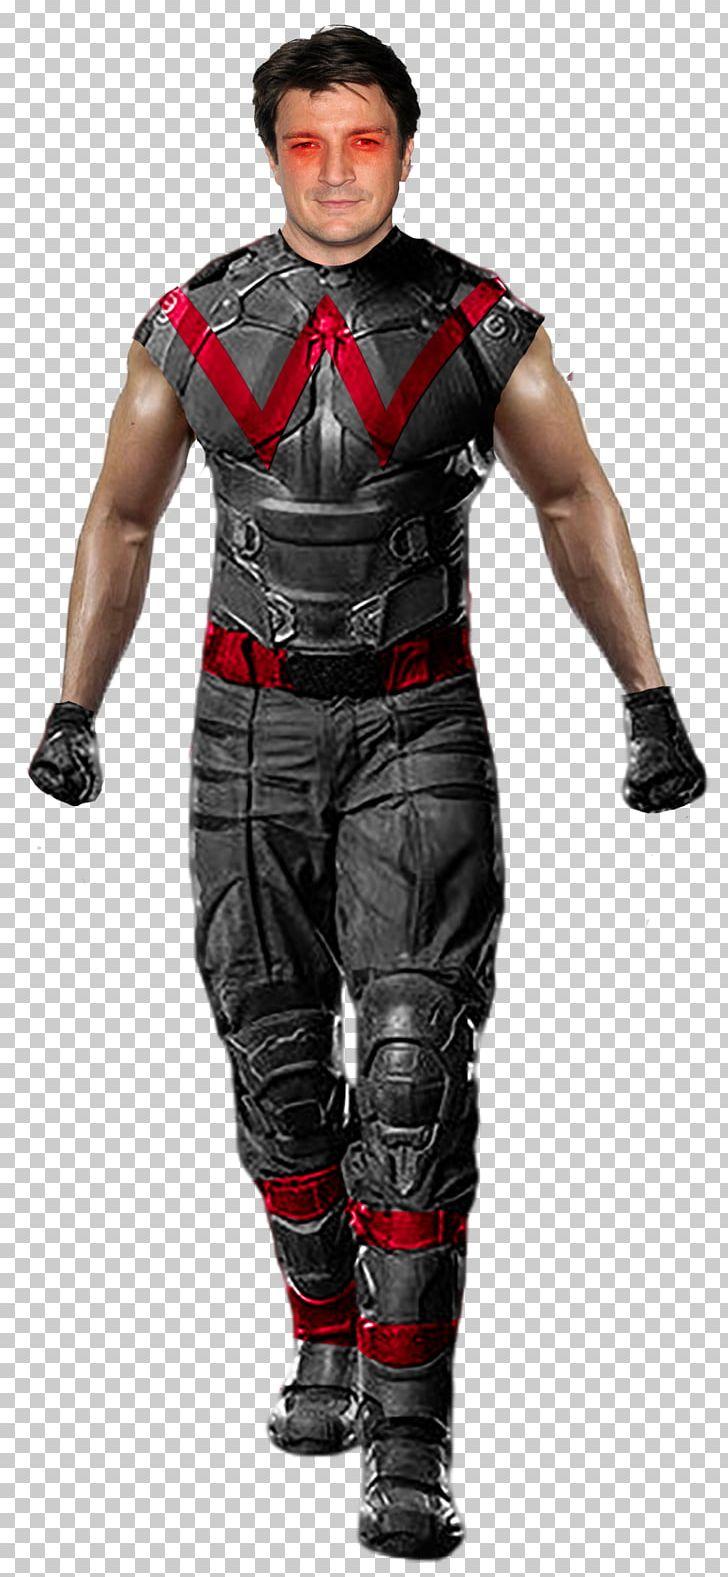 X-Men Origins: Wolverine Professor X Quicksilver Jean Grey PNG, Clipart, Action Figure, Comic, Costume, Cyclops, Hawkeye Free PNG Download